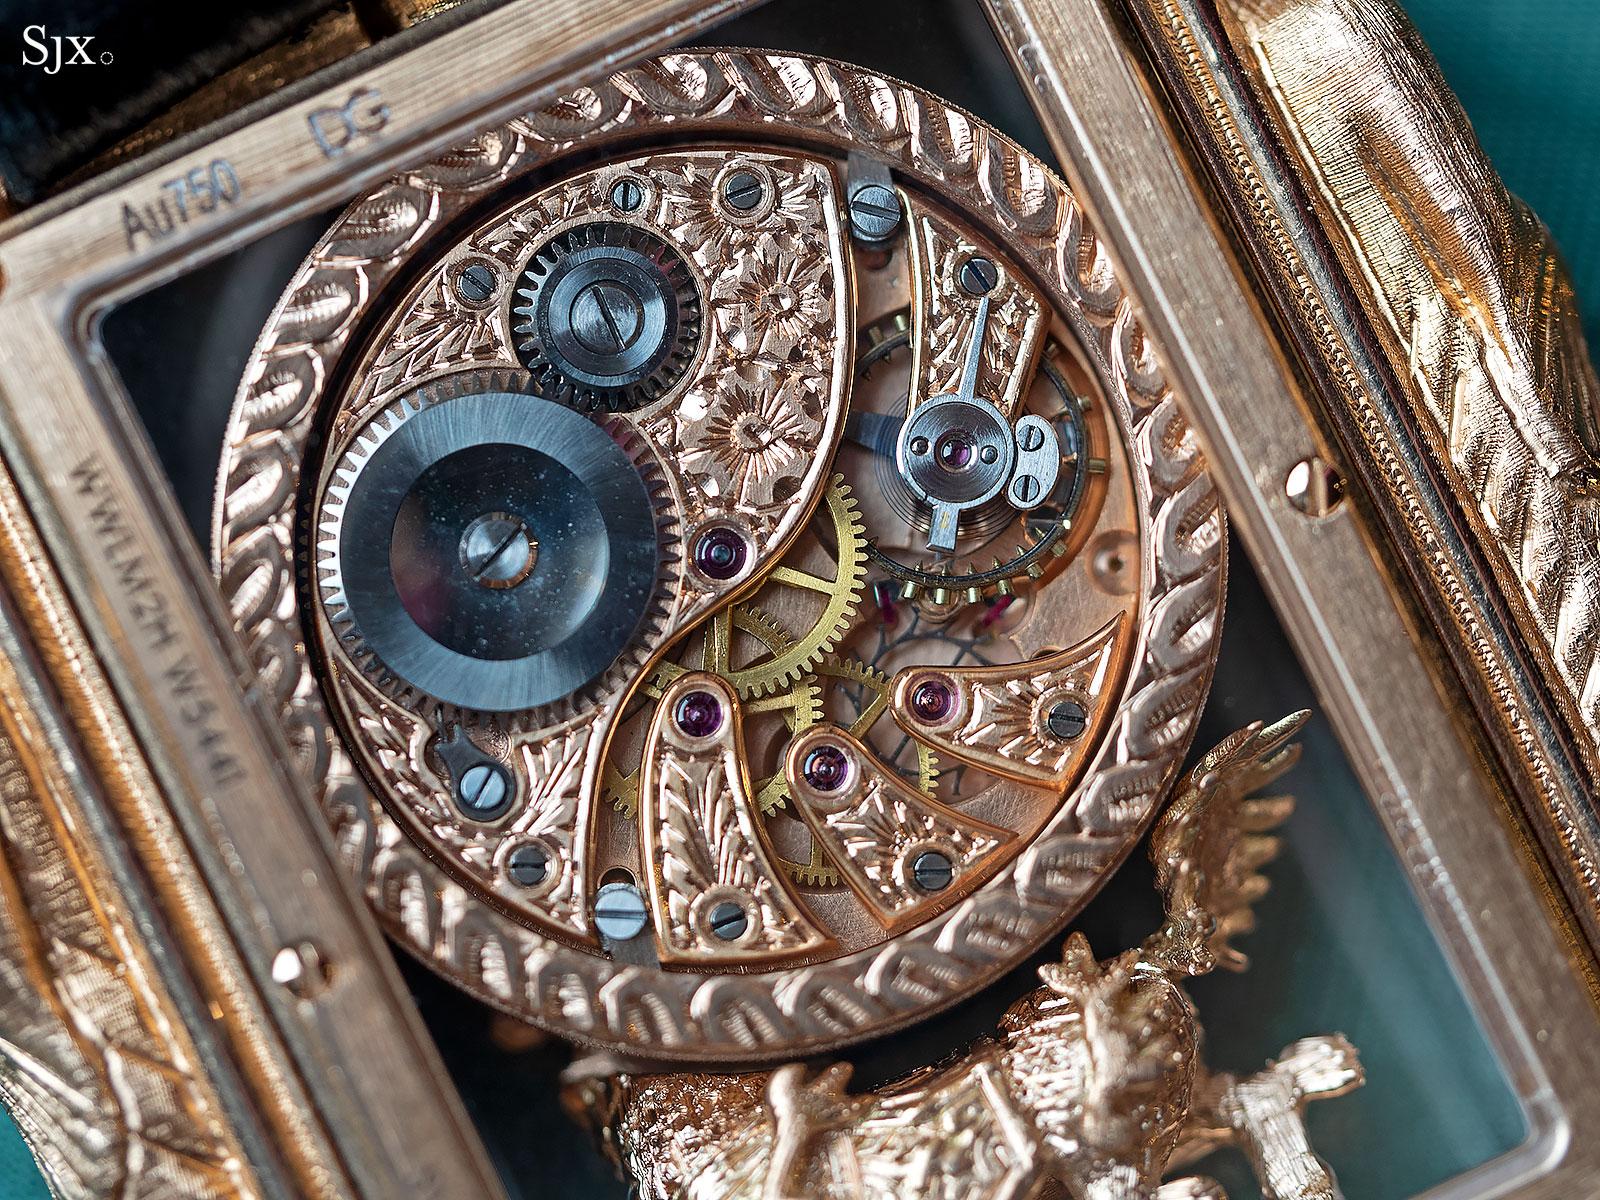 Dolce Gabbana Alta Orologeria Qilin watch 7